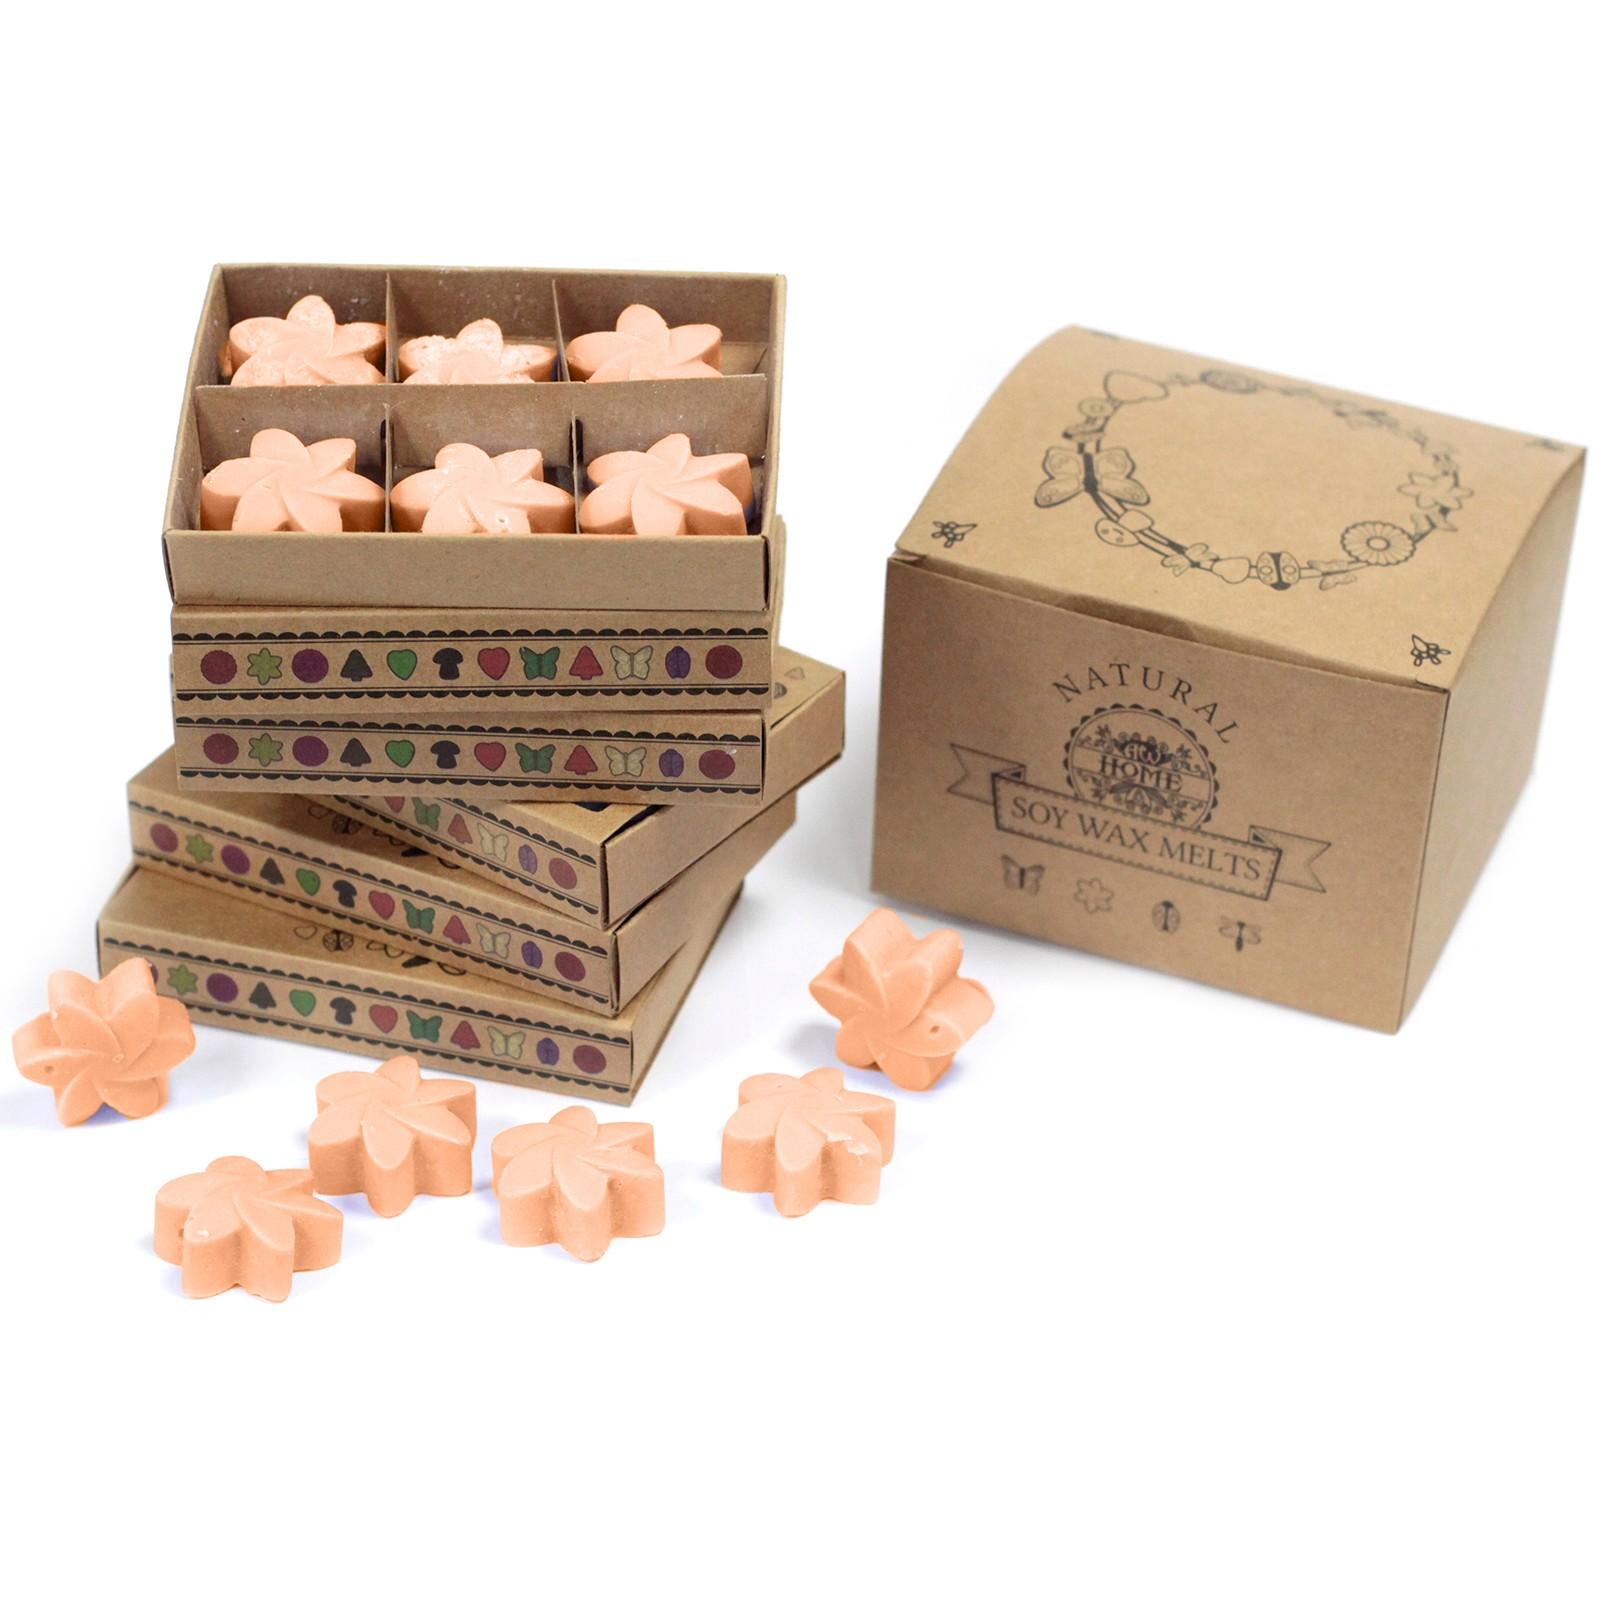 Box of 6 Wax Melts Tuberose